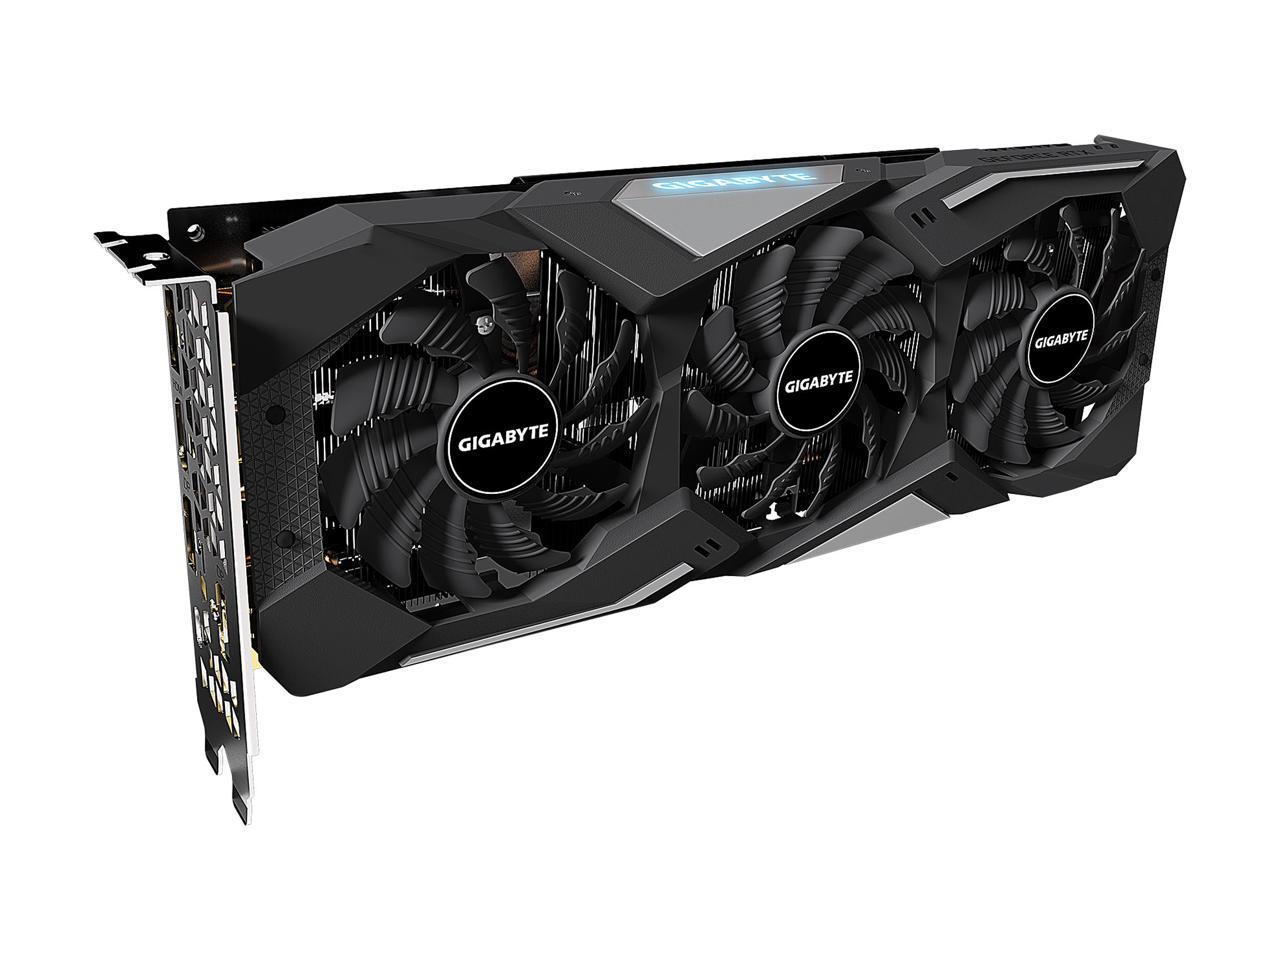 Details about GIGABYTE GeForce RTX 2060 Super GAMING OC 8G Graphics Card, 3  x WINDFORCE Fans,